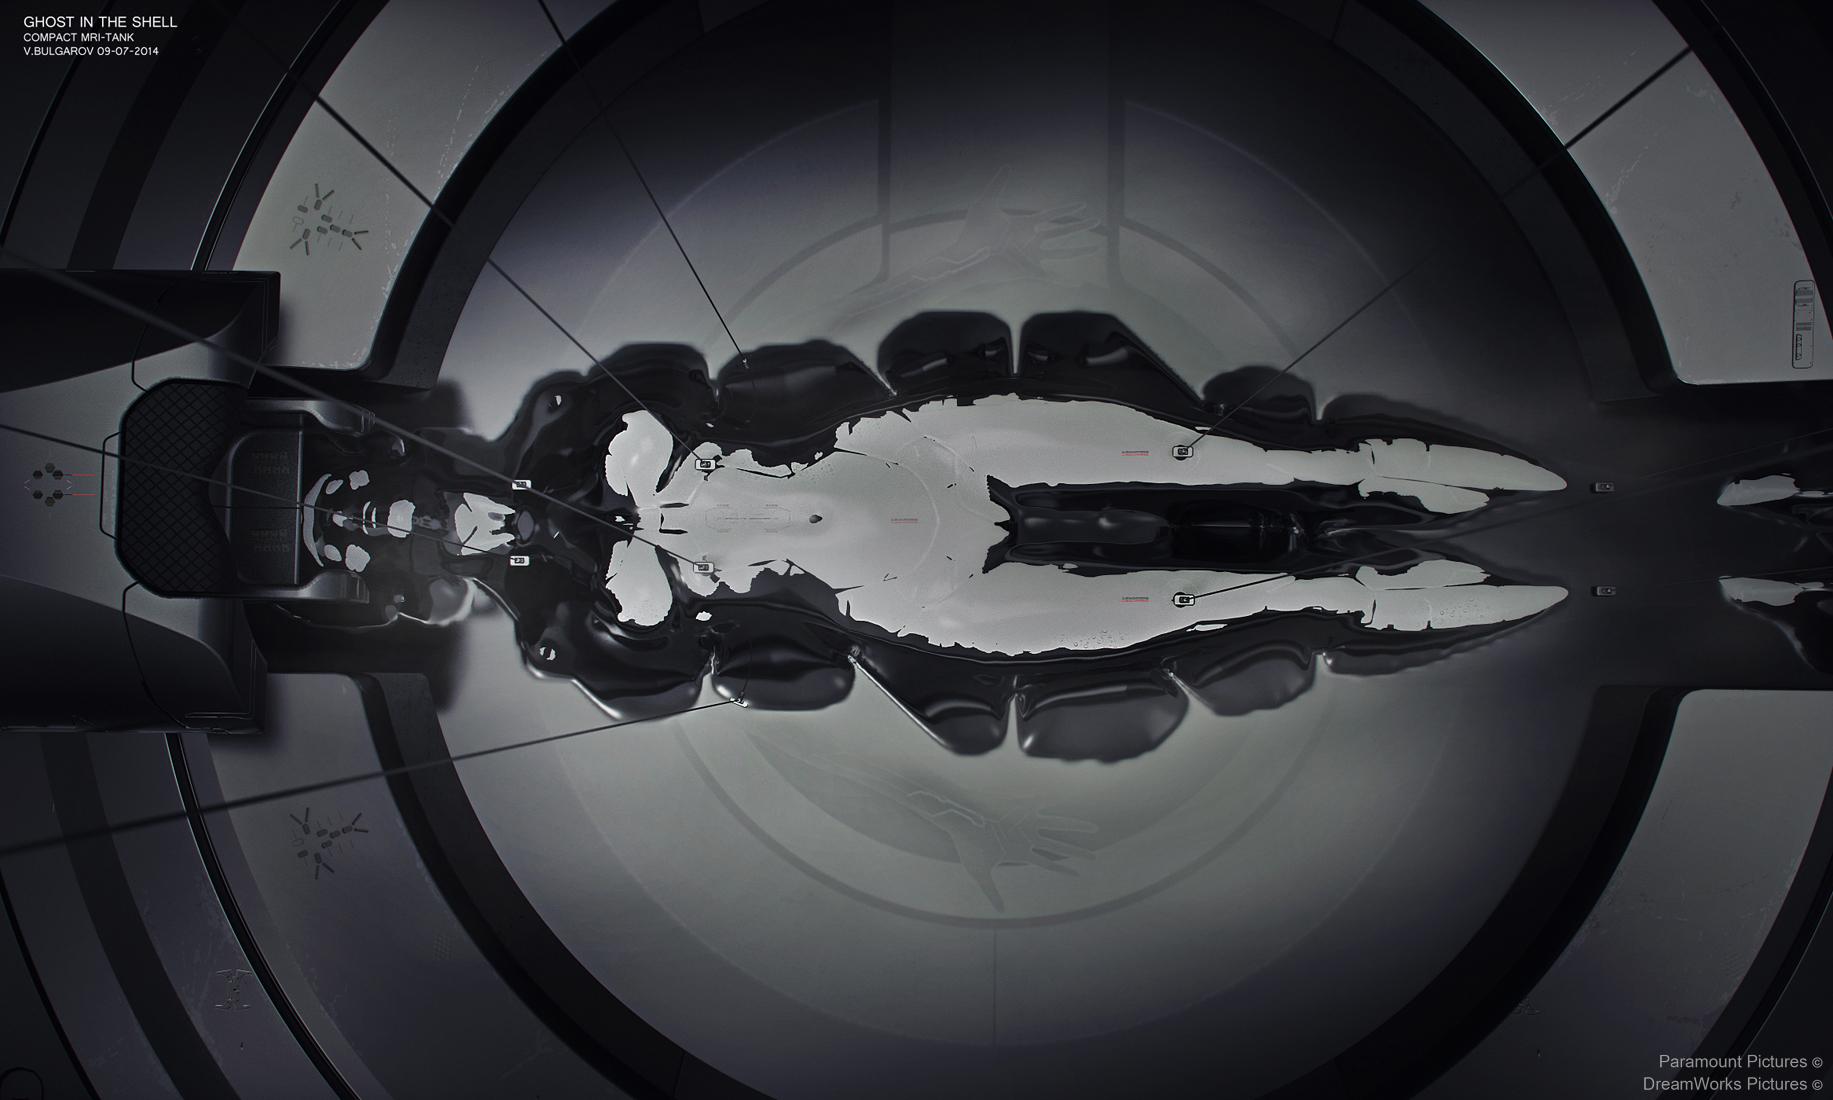 Ghost_CompactMRI-Tank_09-07-2014_04.jpg